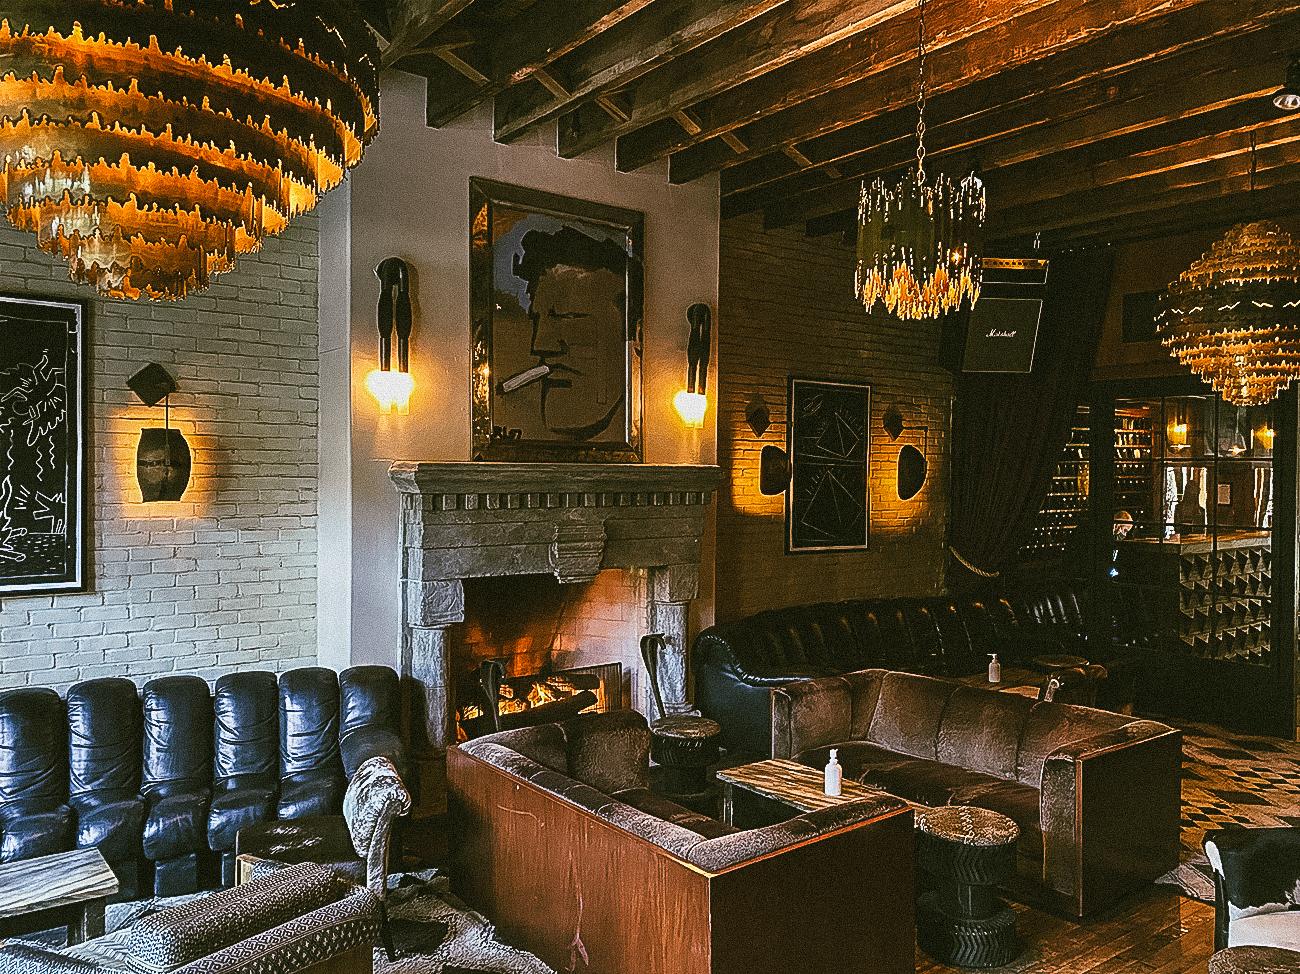 Belmondo cocktail Ludlow Bar